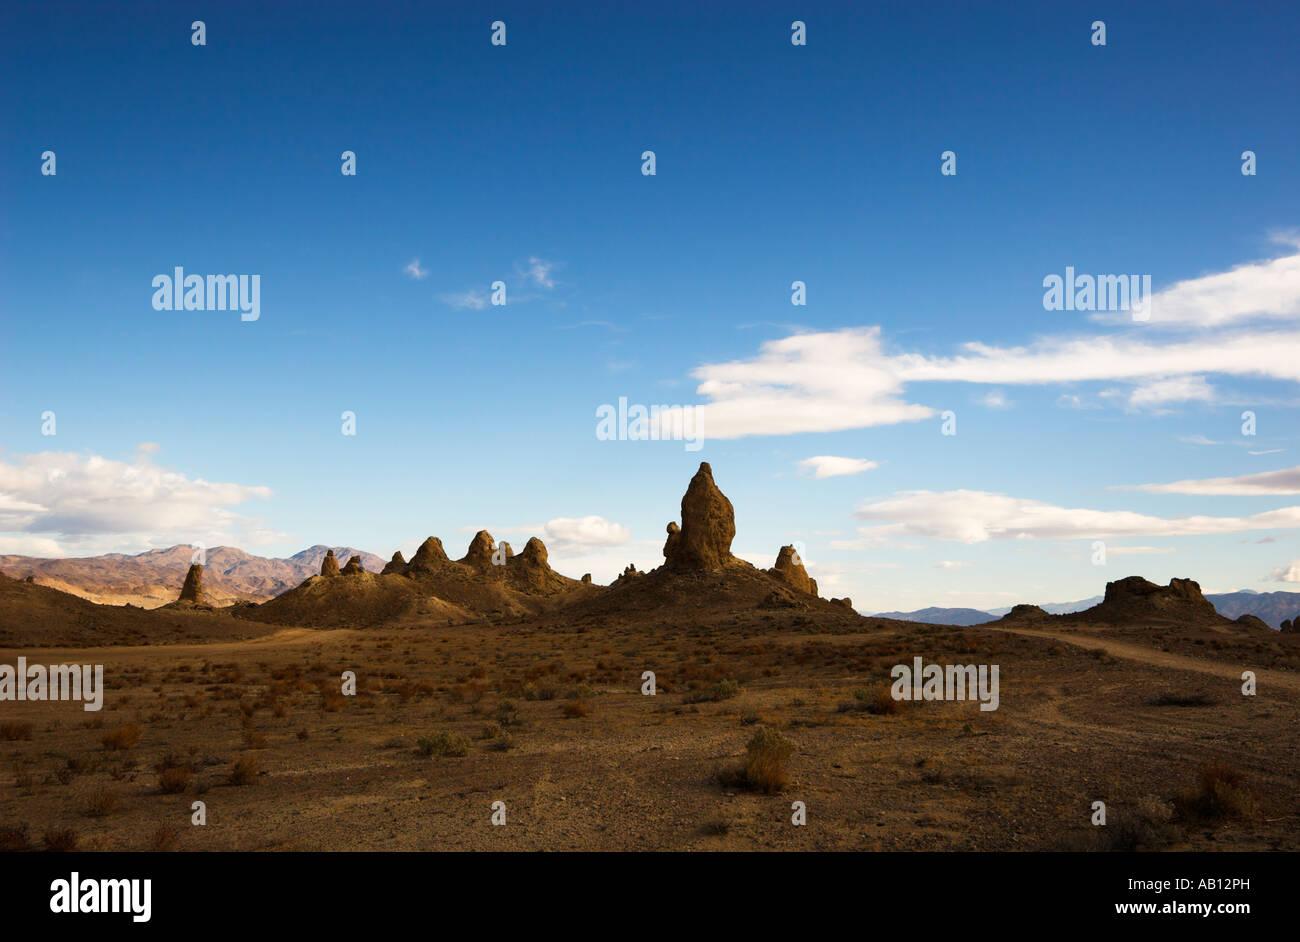 Trona Pinnacles National Natural Landmark, Mojave Desert, California, USA (Apr 2007) - Stock Image